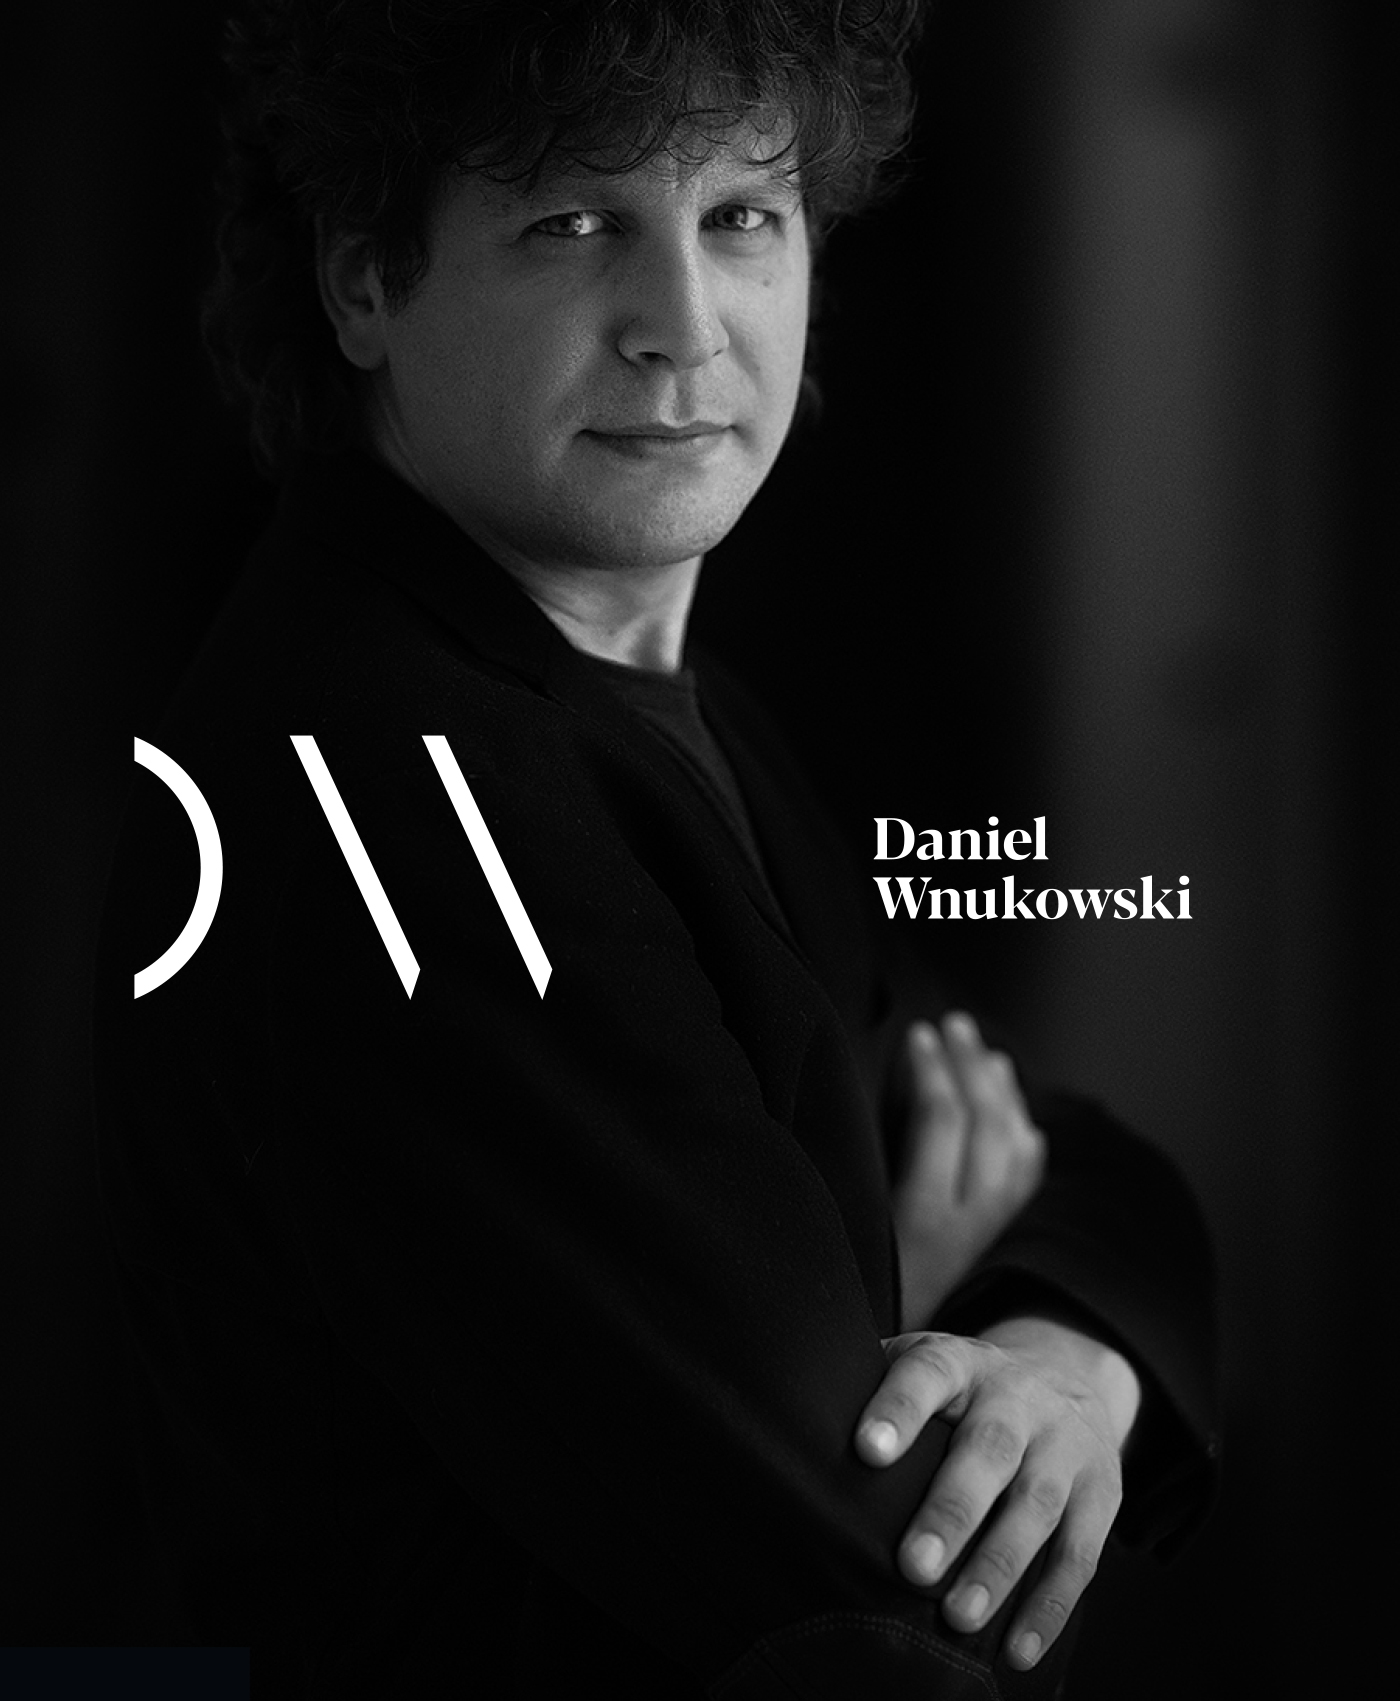 Daniel-Wnukowski